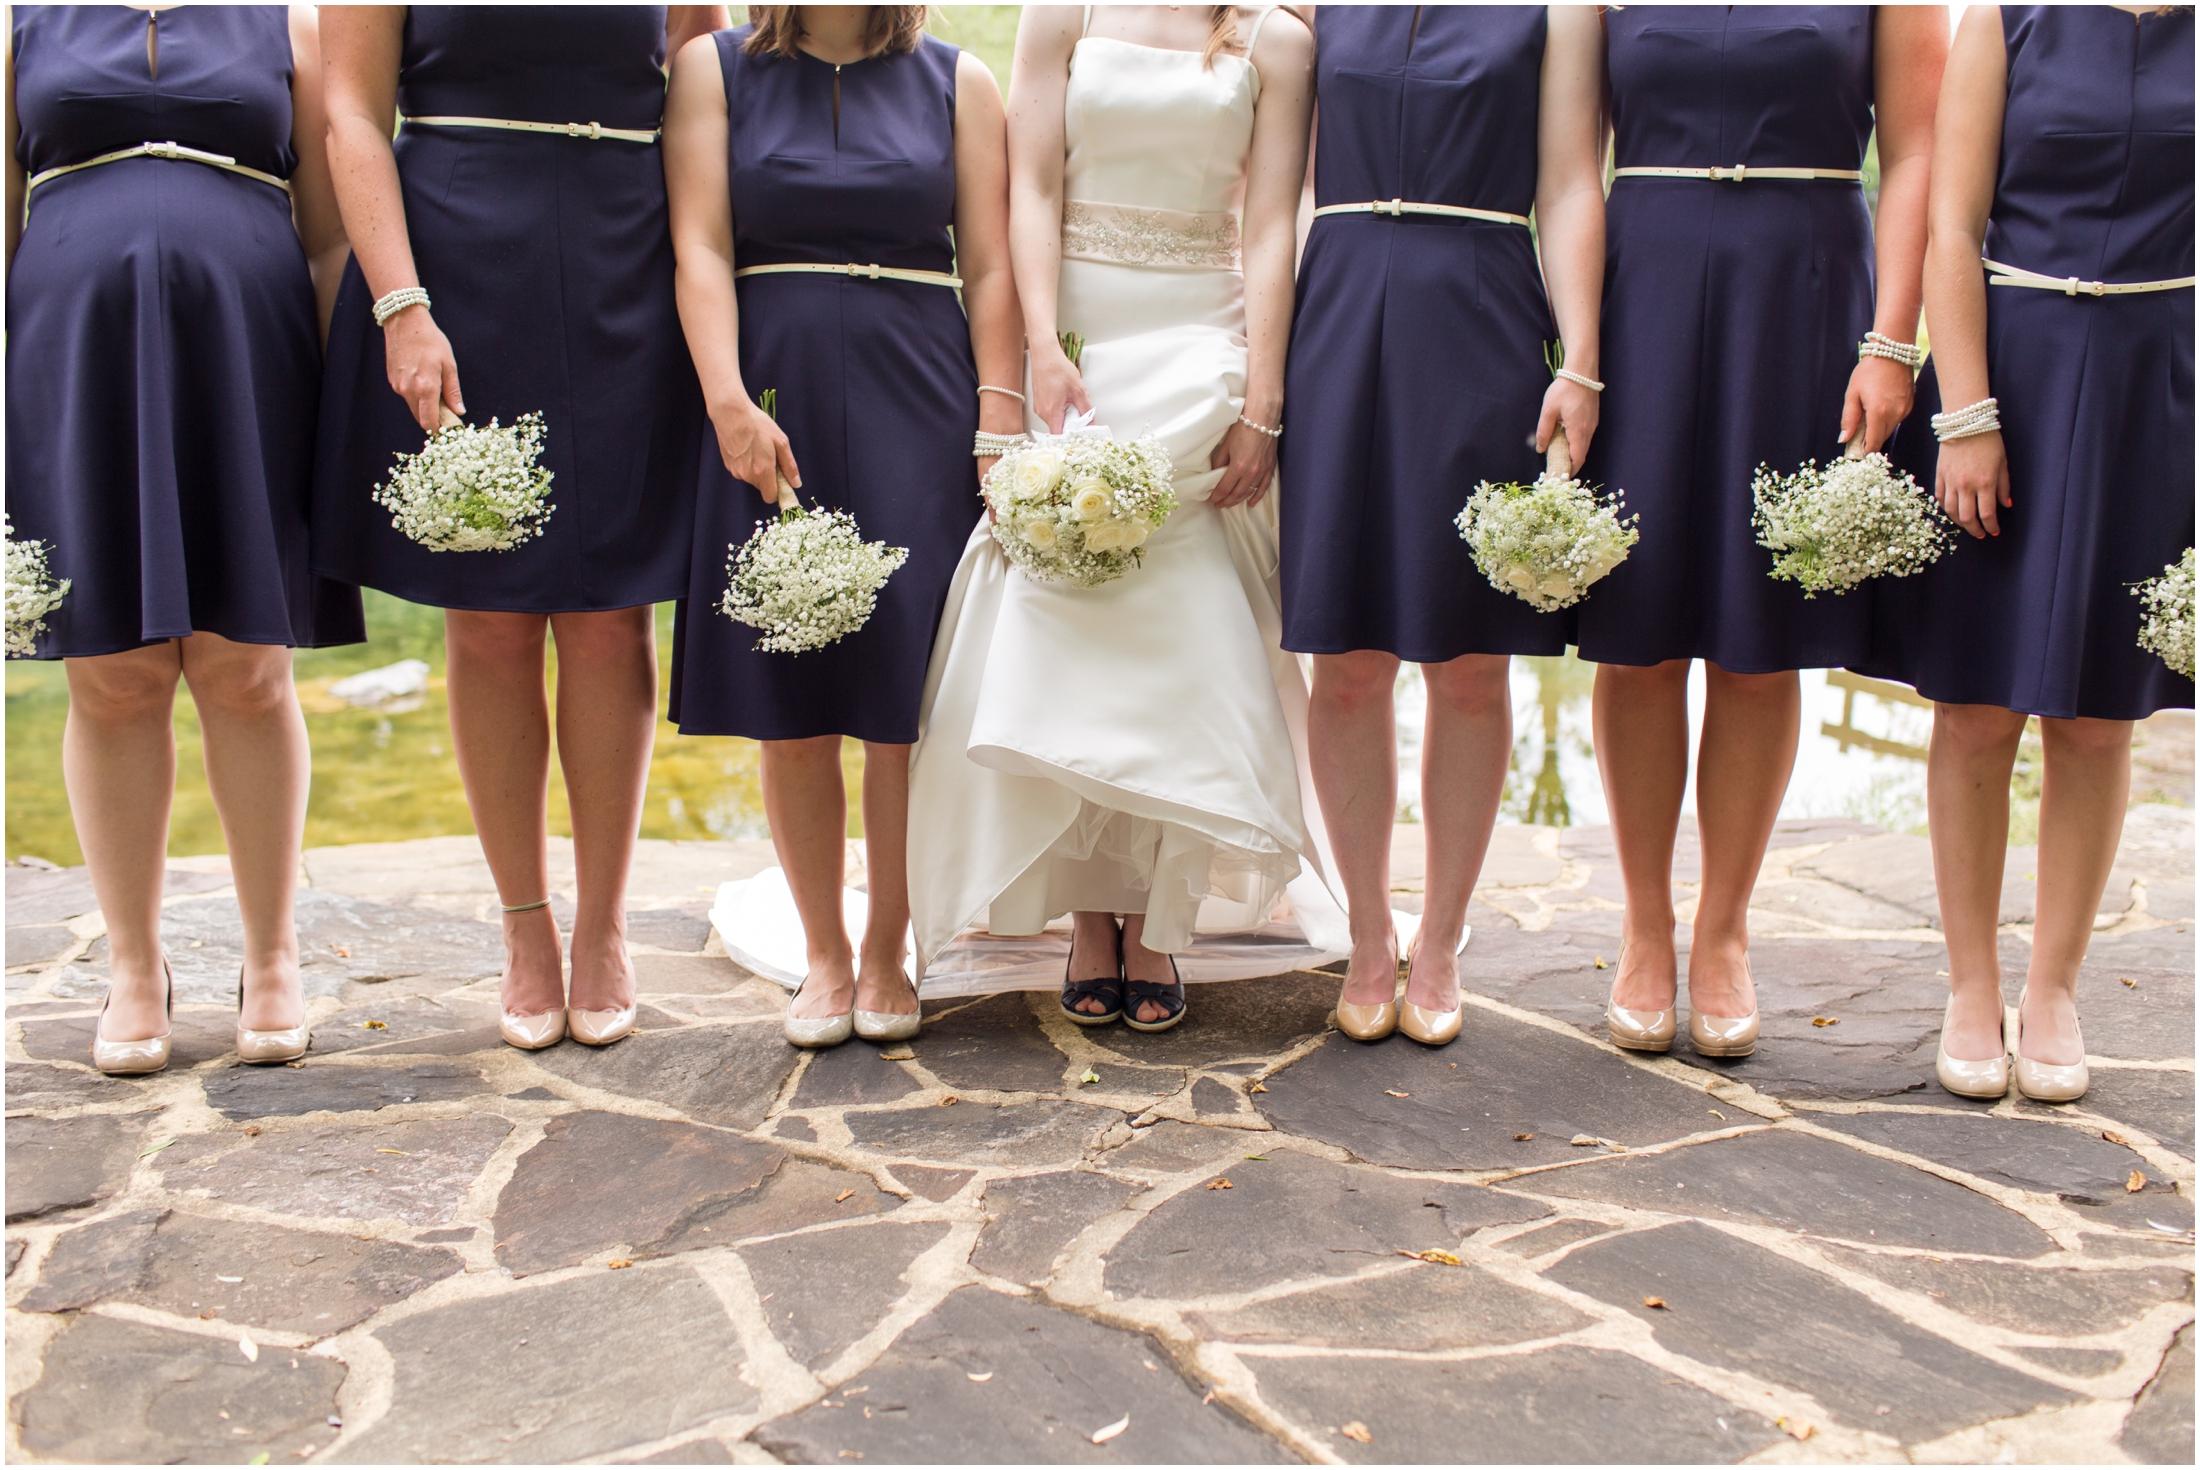 Nash-Wedding-Bridal-Party-578.jpg